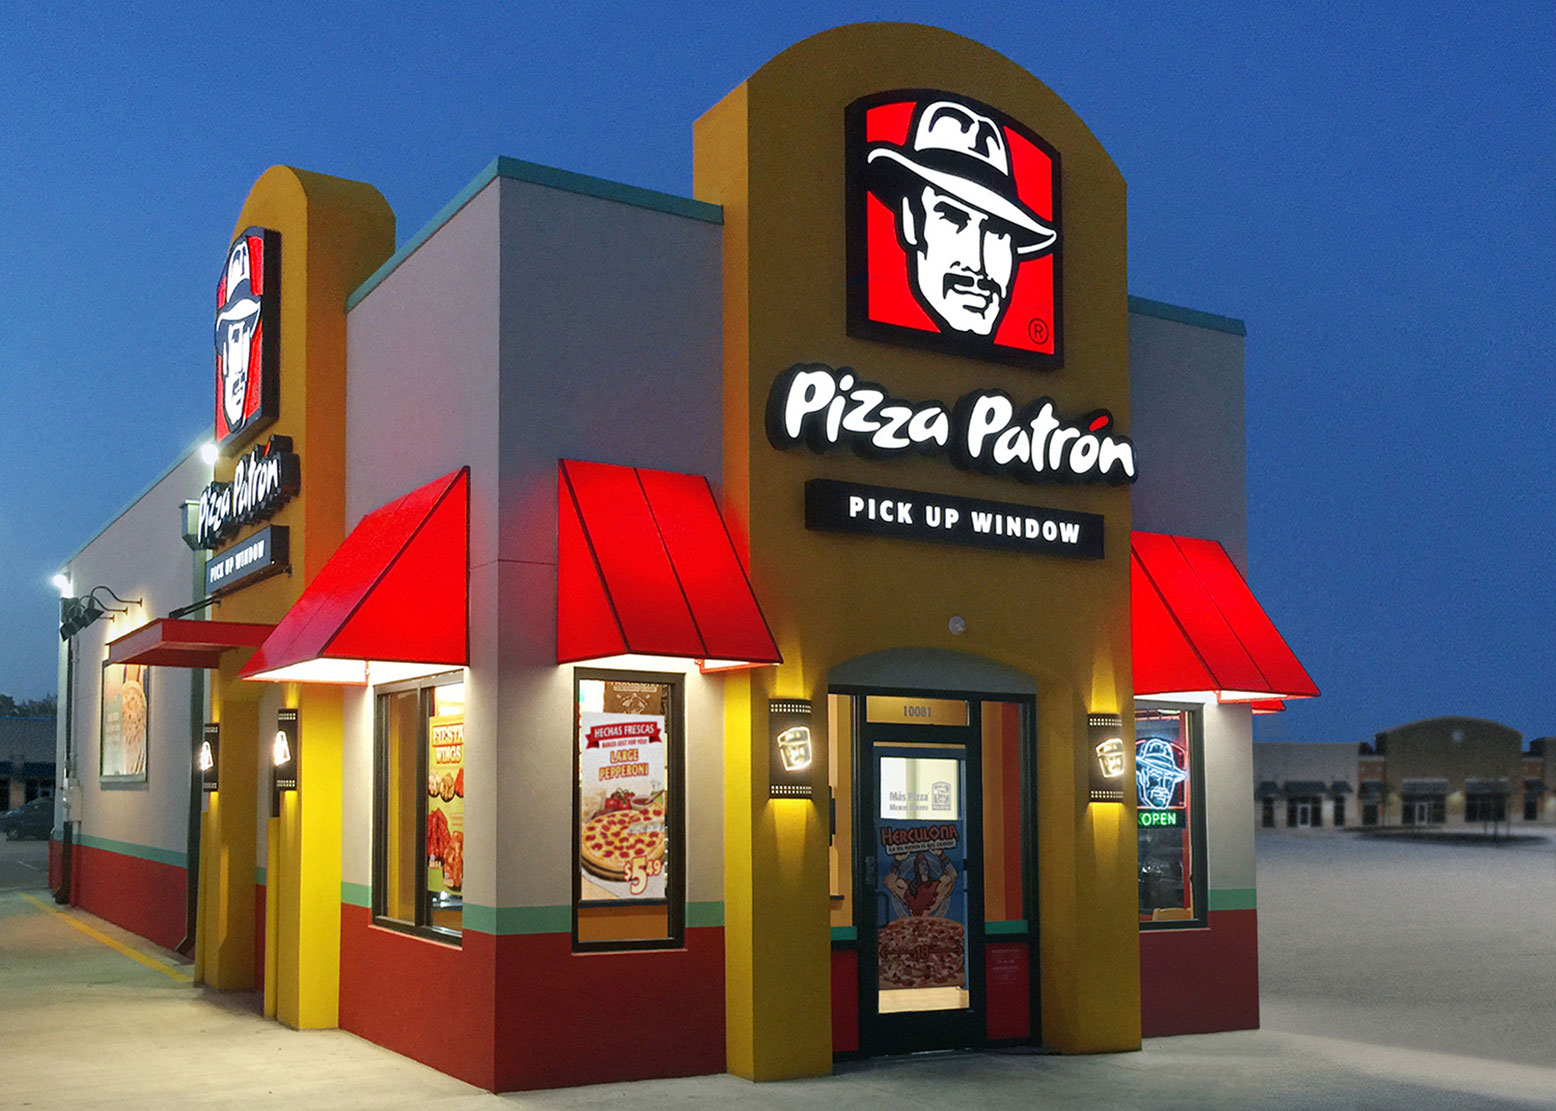 Pizza Patrón - Pizza Patrón Sets All-Time Sales Records - Pizza Patrón